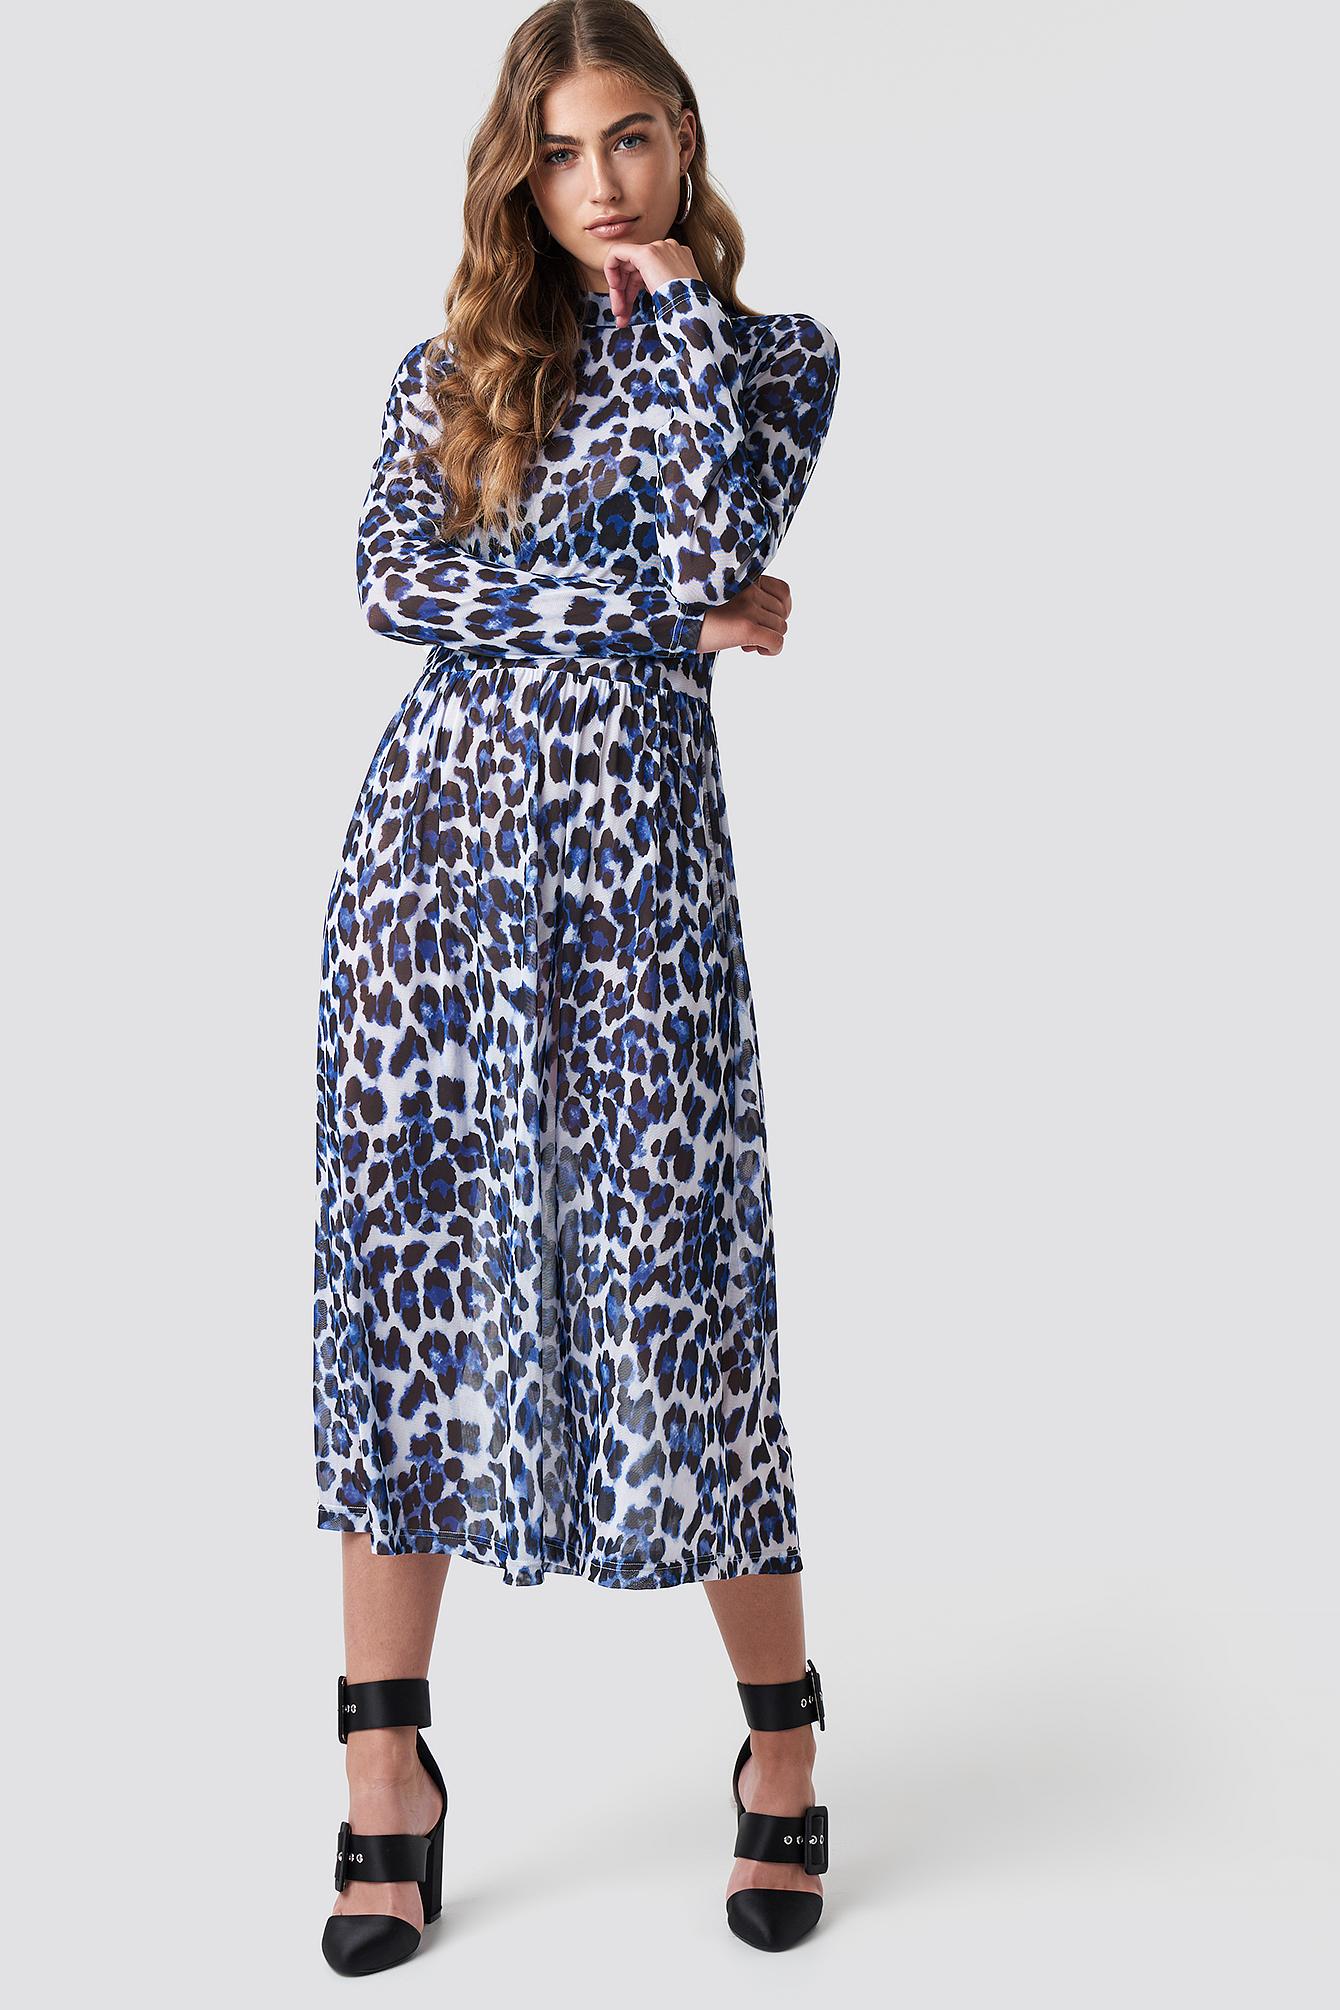 RUT & CIRCLE LEO MESH DRESS - BLUE